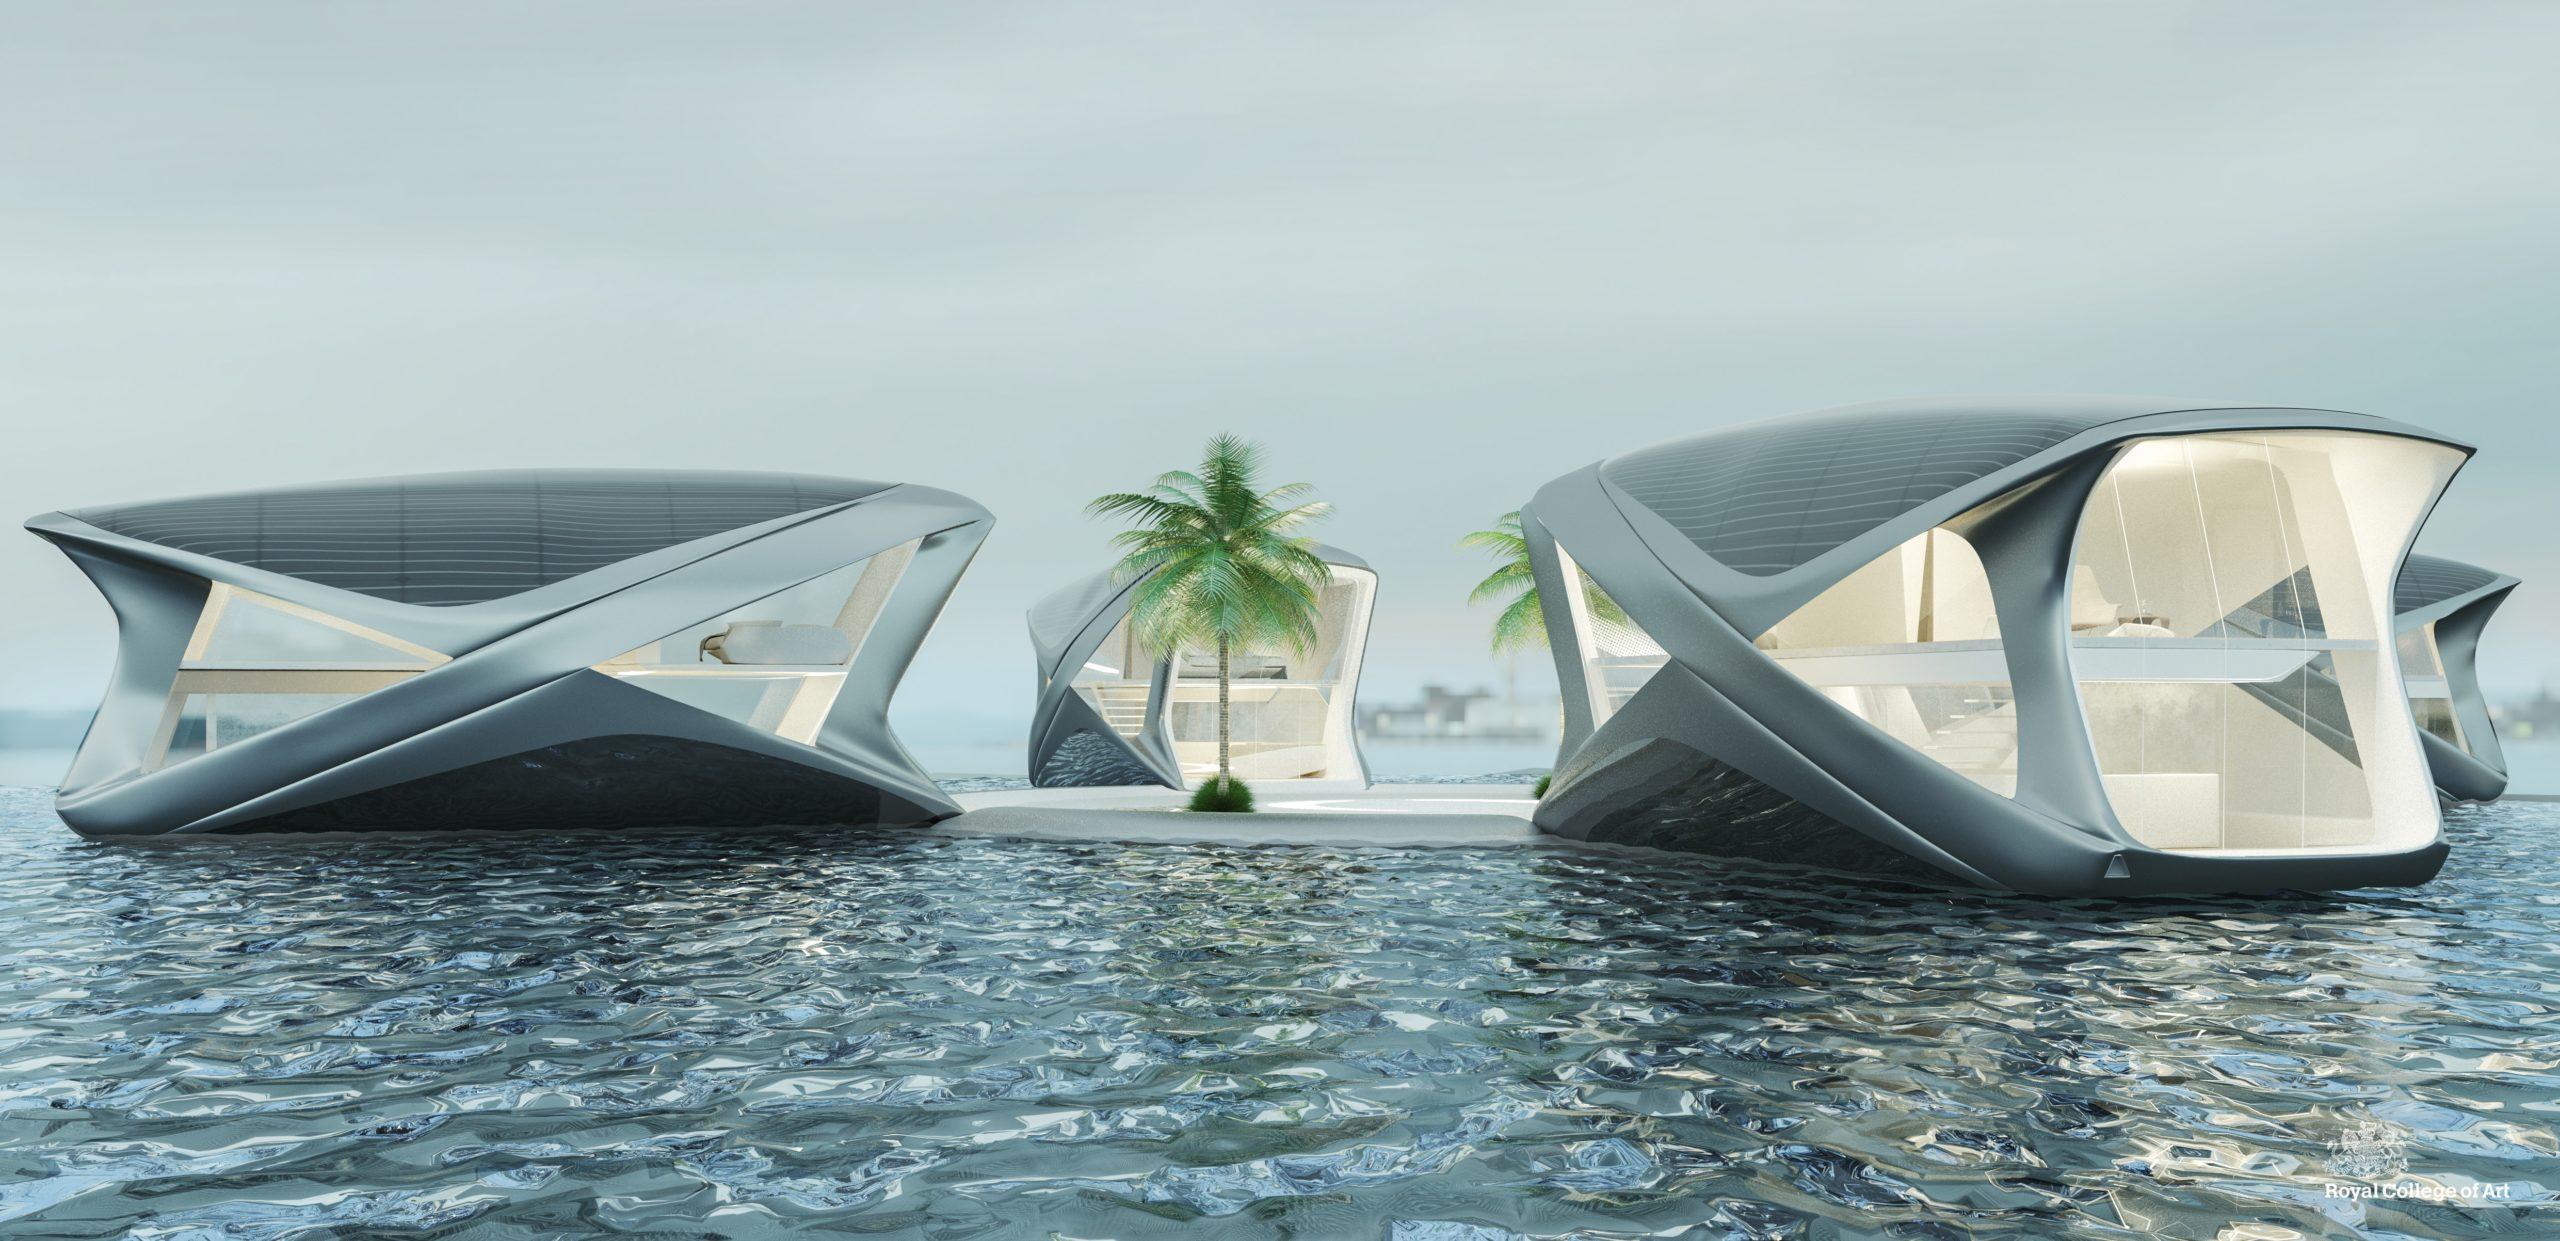 Ocean Community by Wojciech Morsztyn